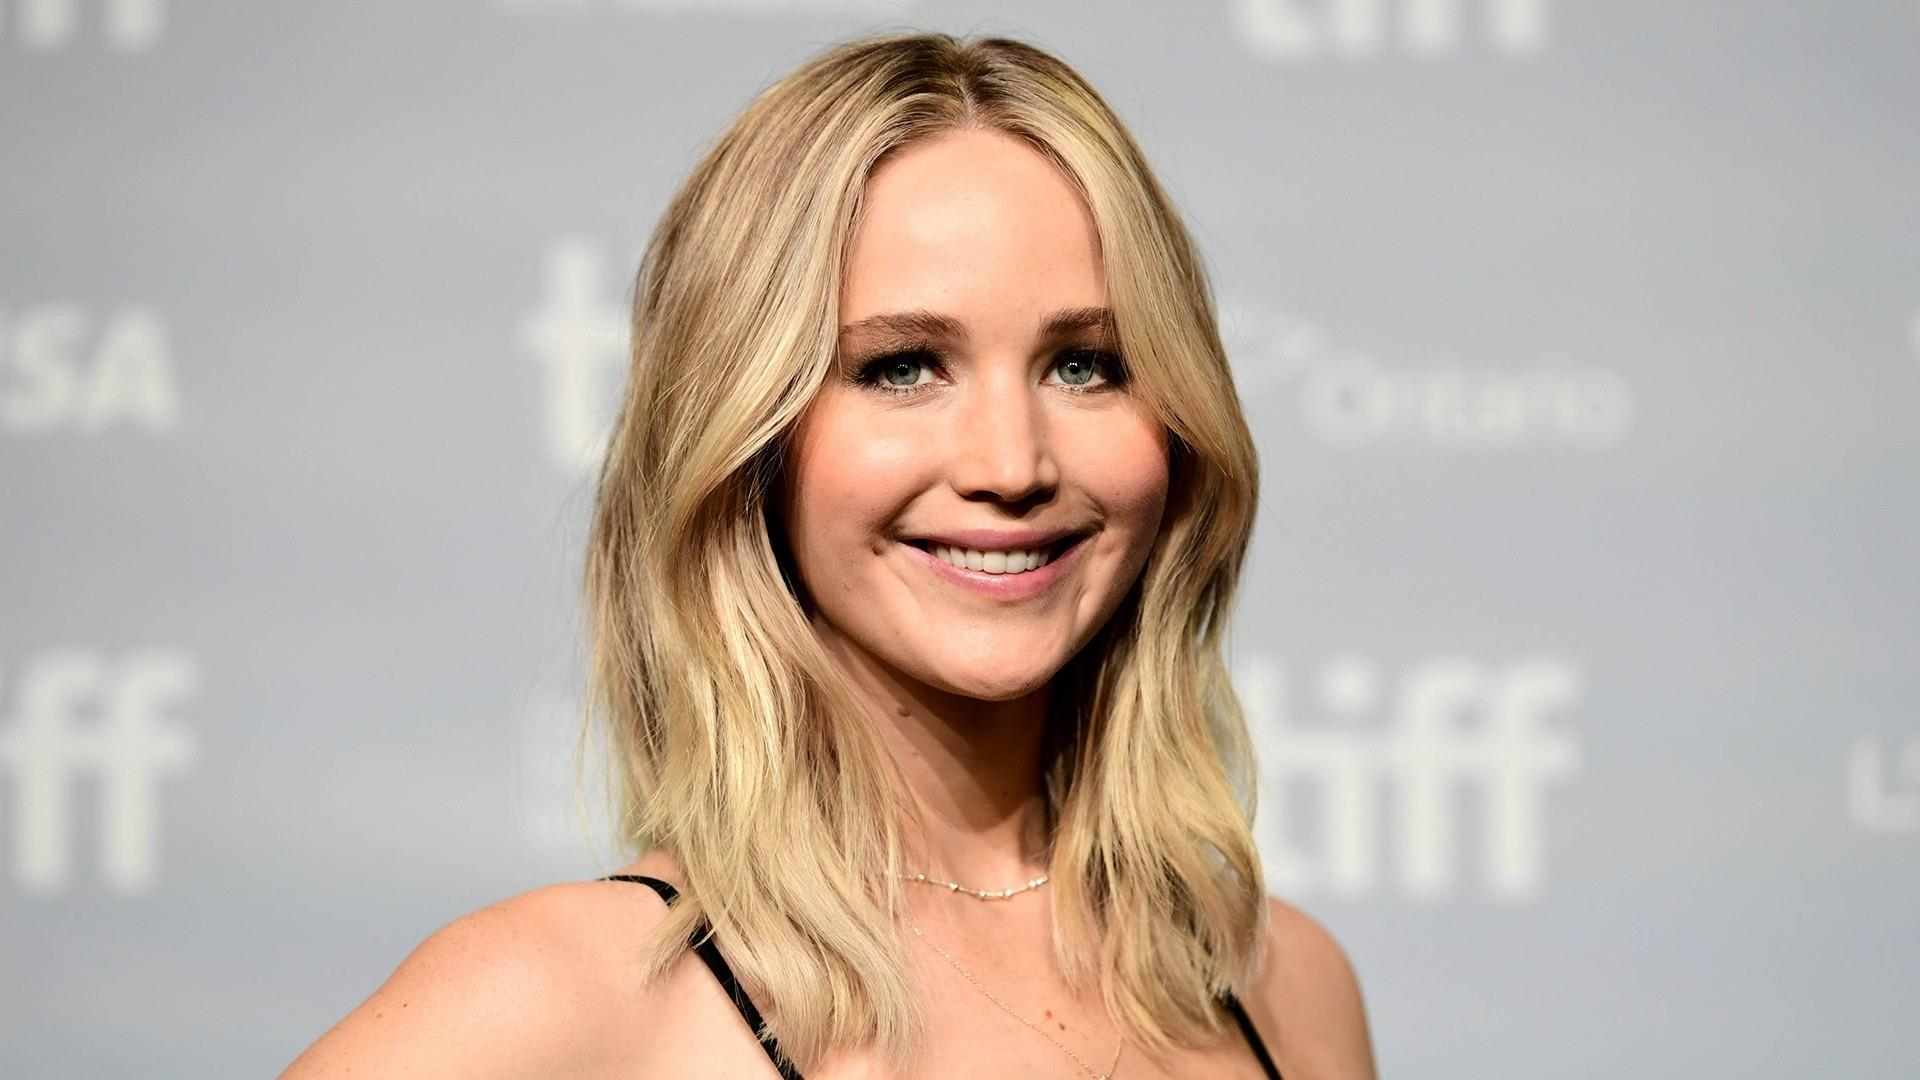 Jennifer Lawrence to marry Cooke Maroney in weekend ceremony